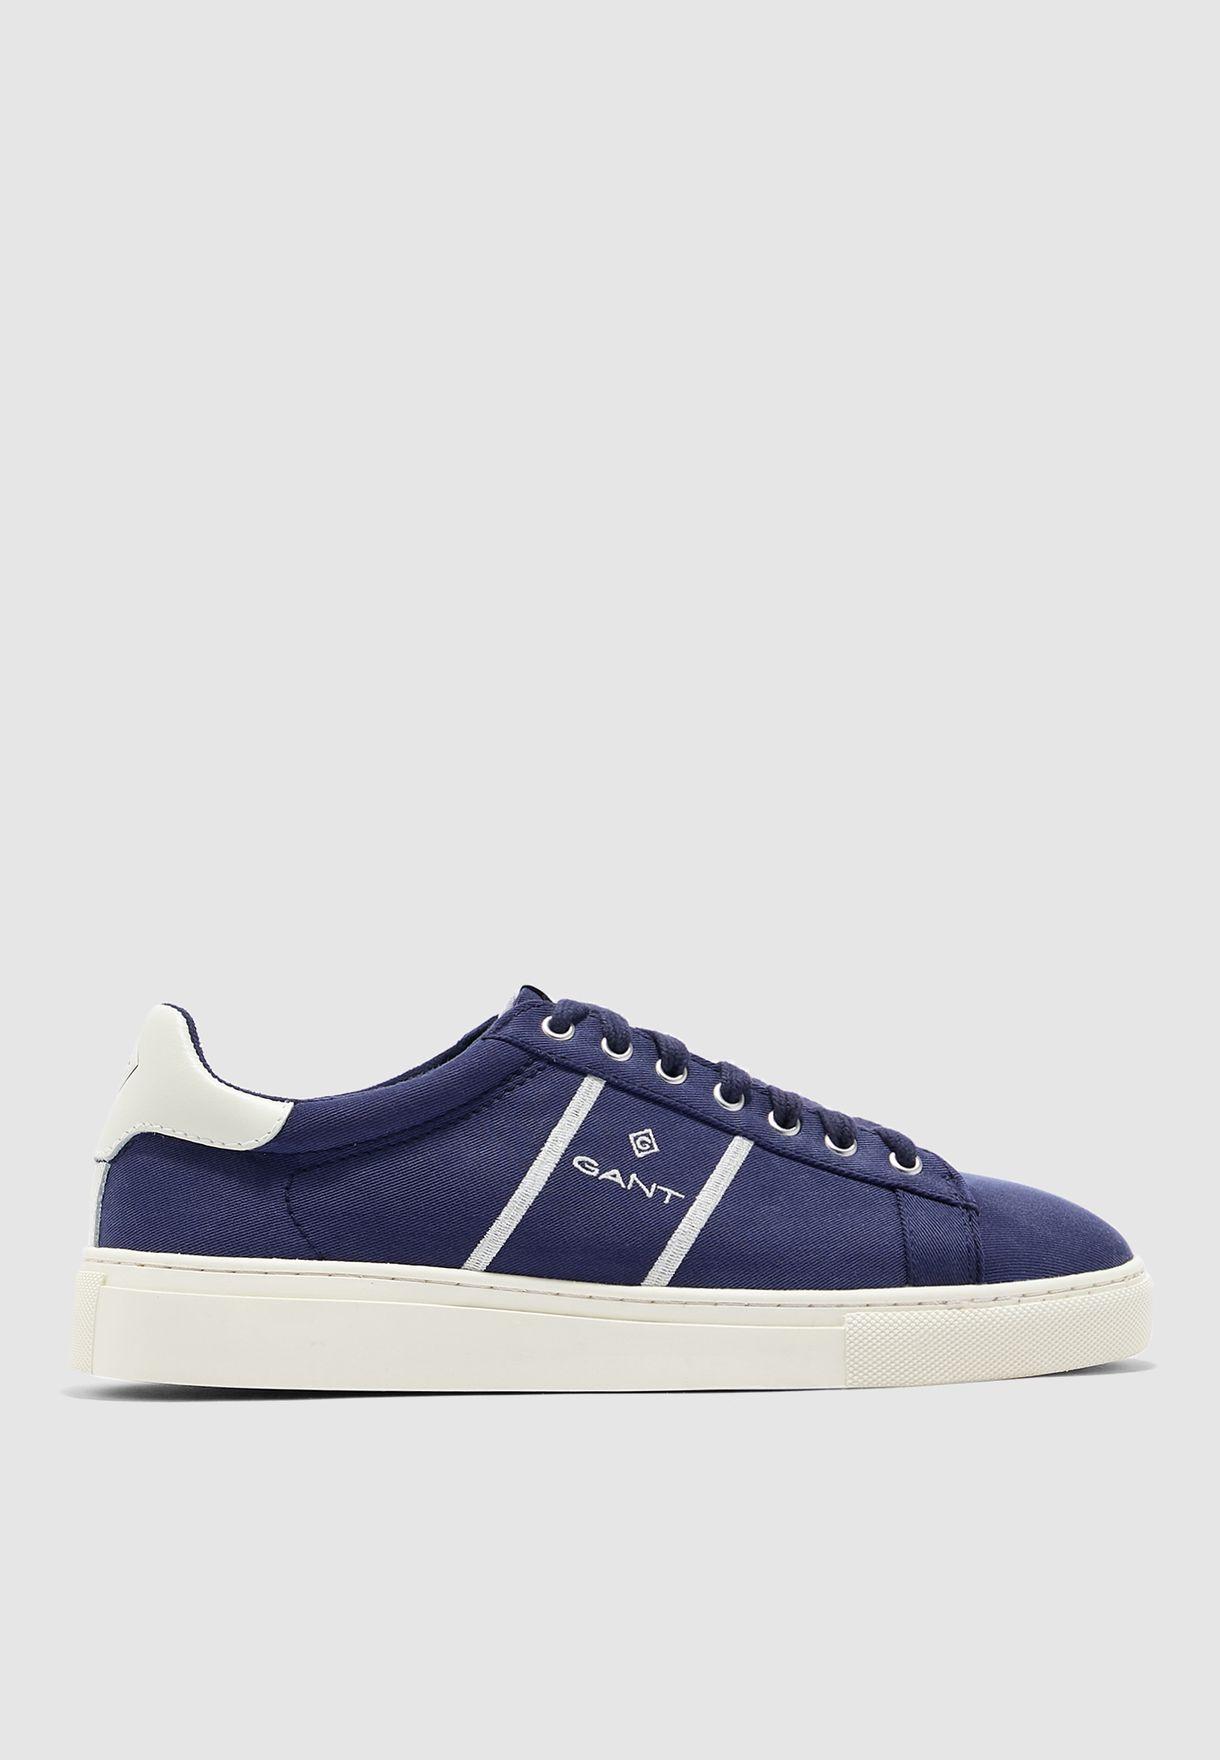 Denver Sneakers